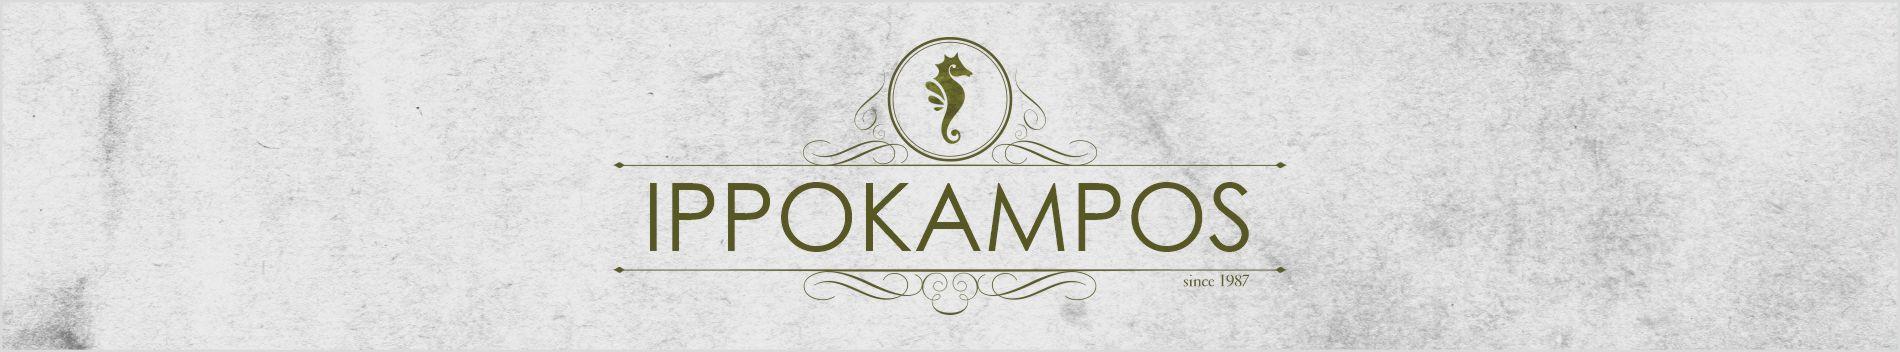 Ippokampos restaurant